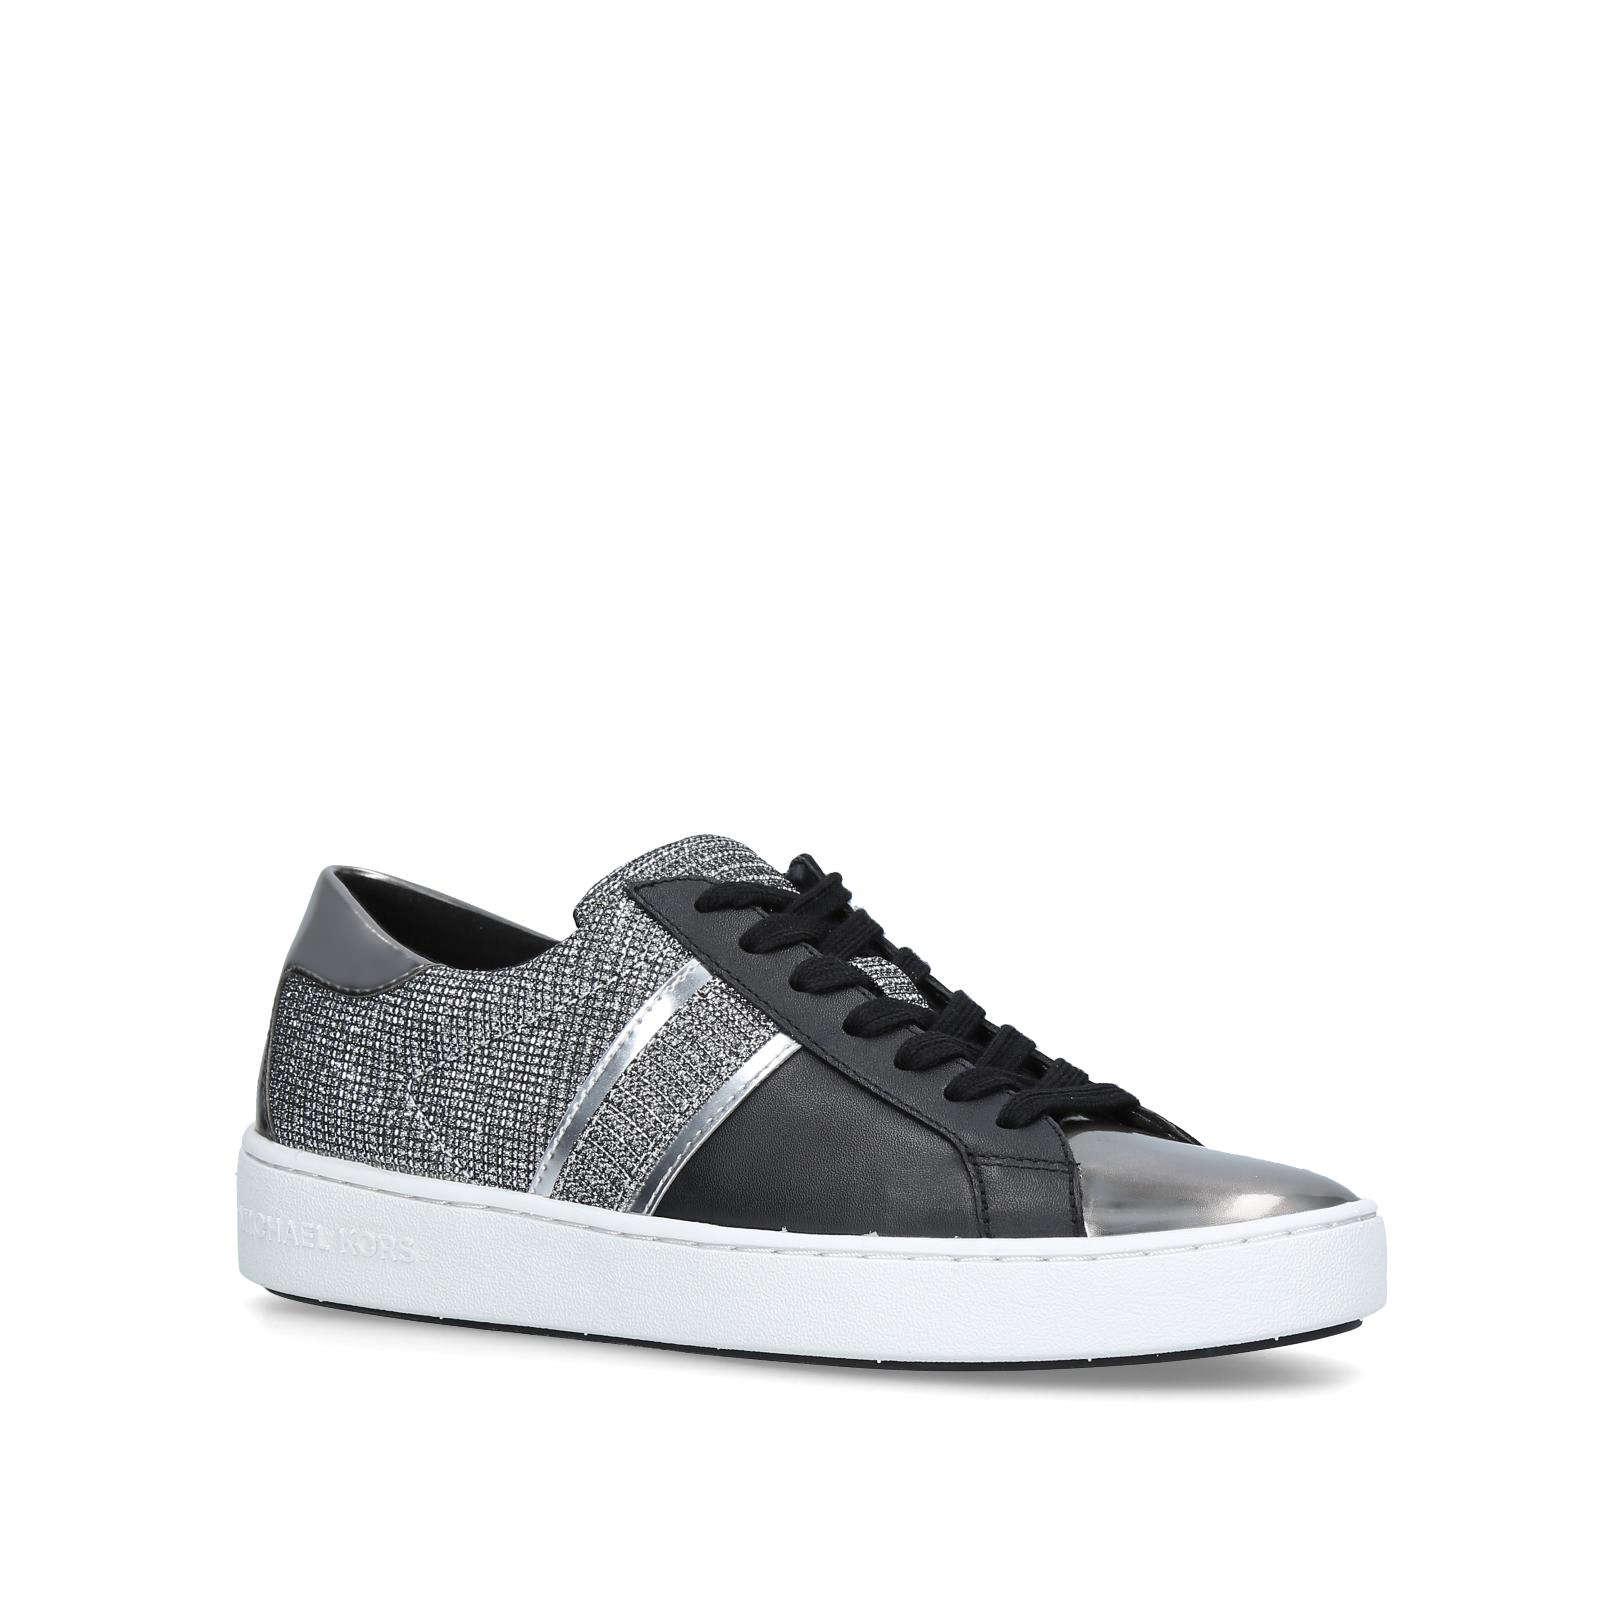 2251c1af139 KEATON STRIPE SNEAKER Keaton Stripe Sneaker No Heel Sneakers Michael  Michael Kors Blk/Other by MICHAEL MICHAEL KORS